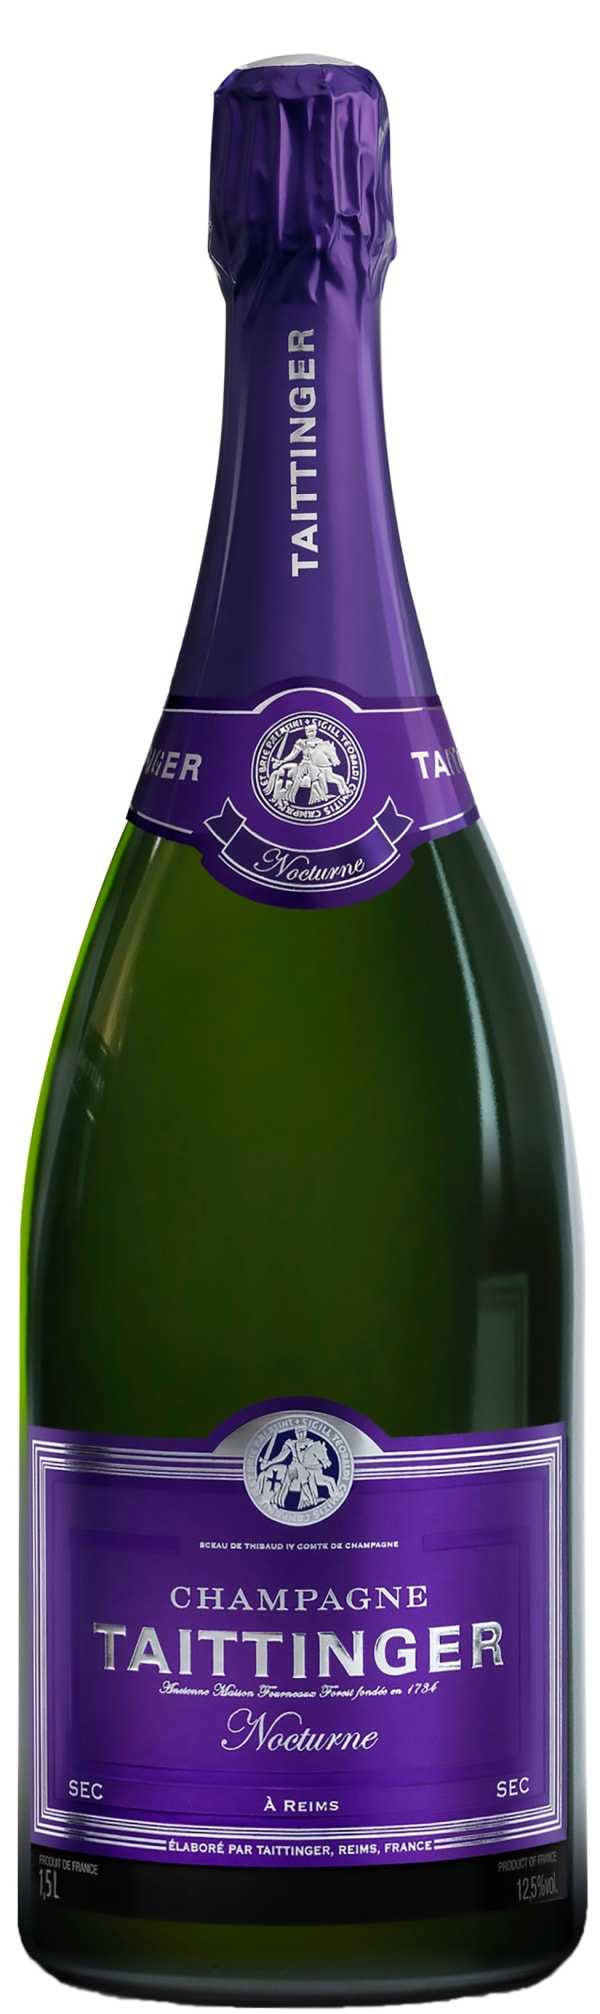 Taittinger Nocturne Champagne Sec